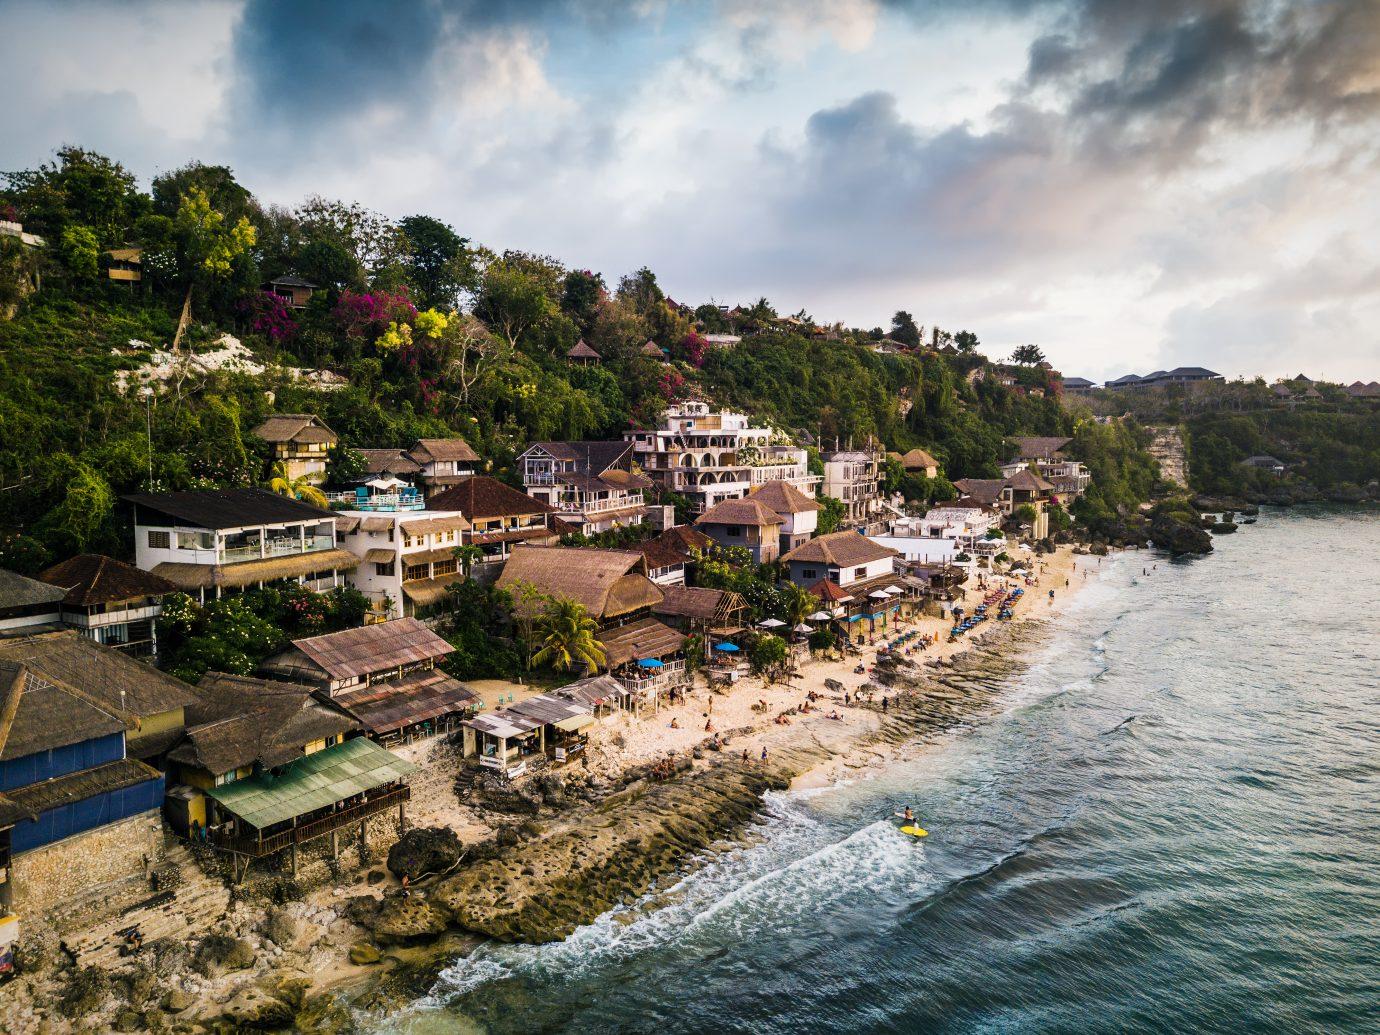 Aerial view of a Beautiful resort at Bali